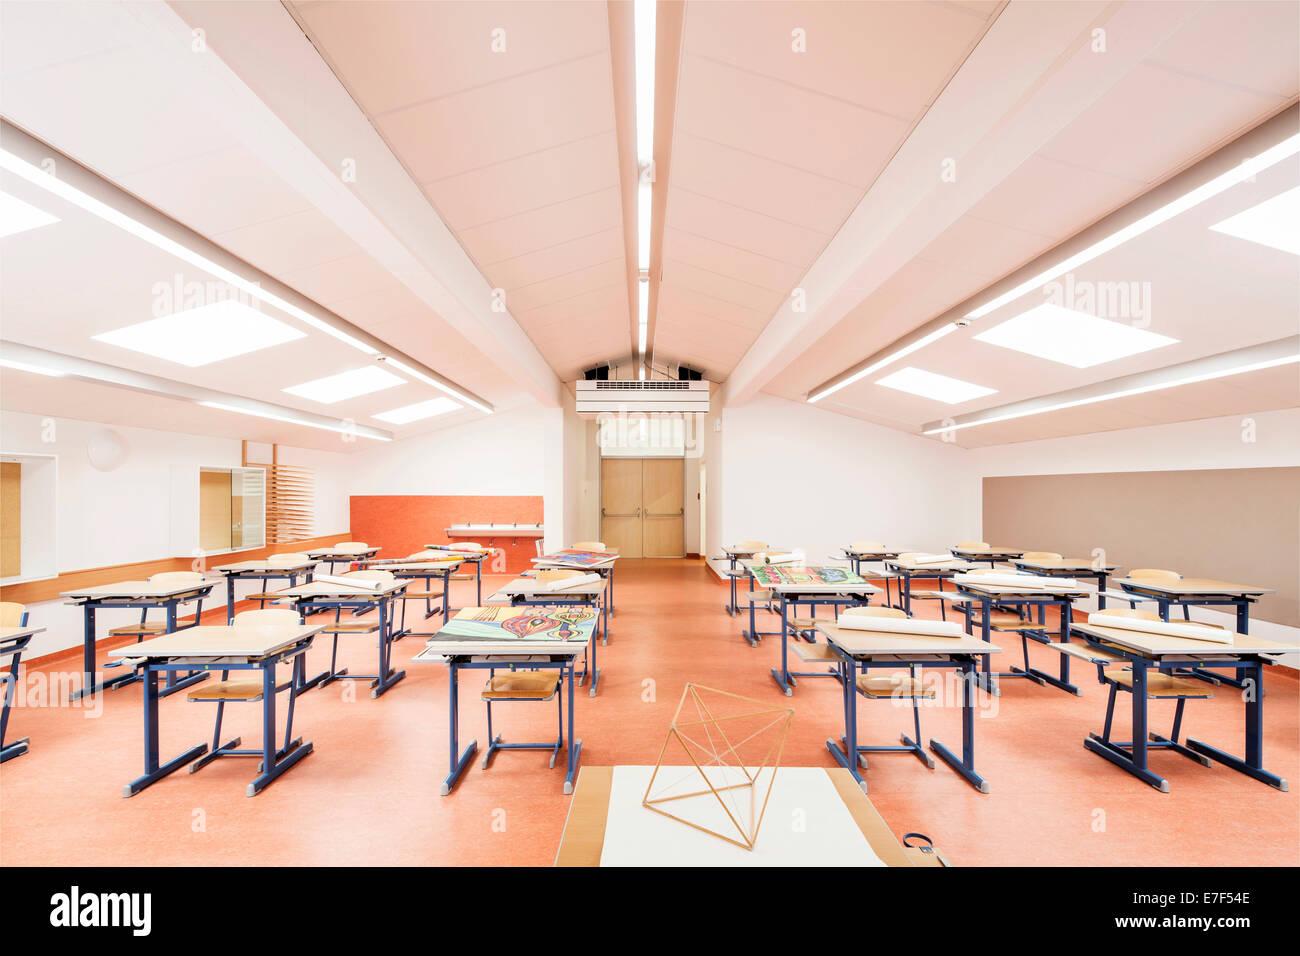 Sala de Arte de una escuela de enseñanza media, Reith im Alpbachtal, Tirol, Austria Imagen De Stock